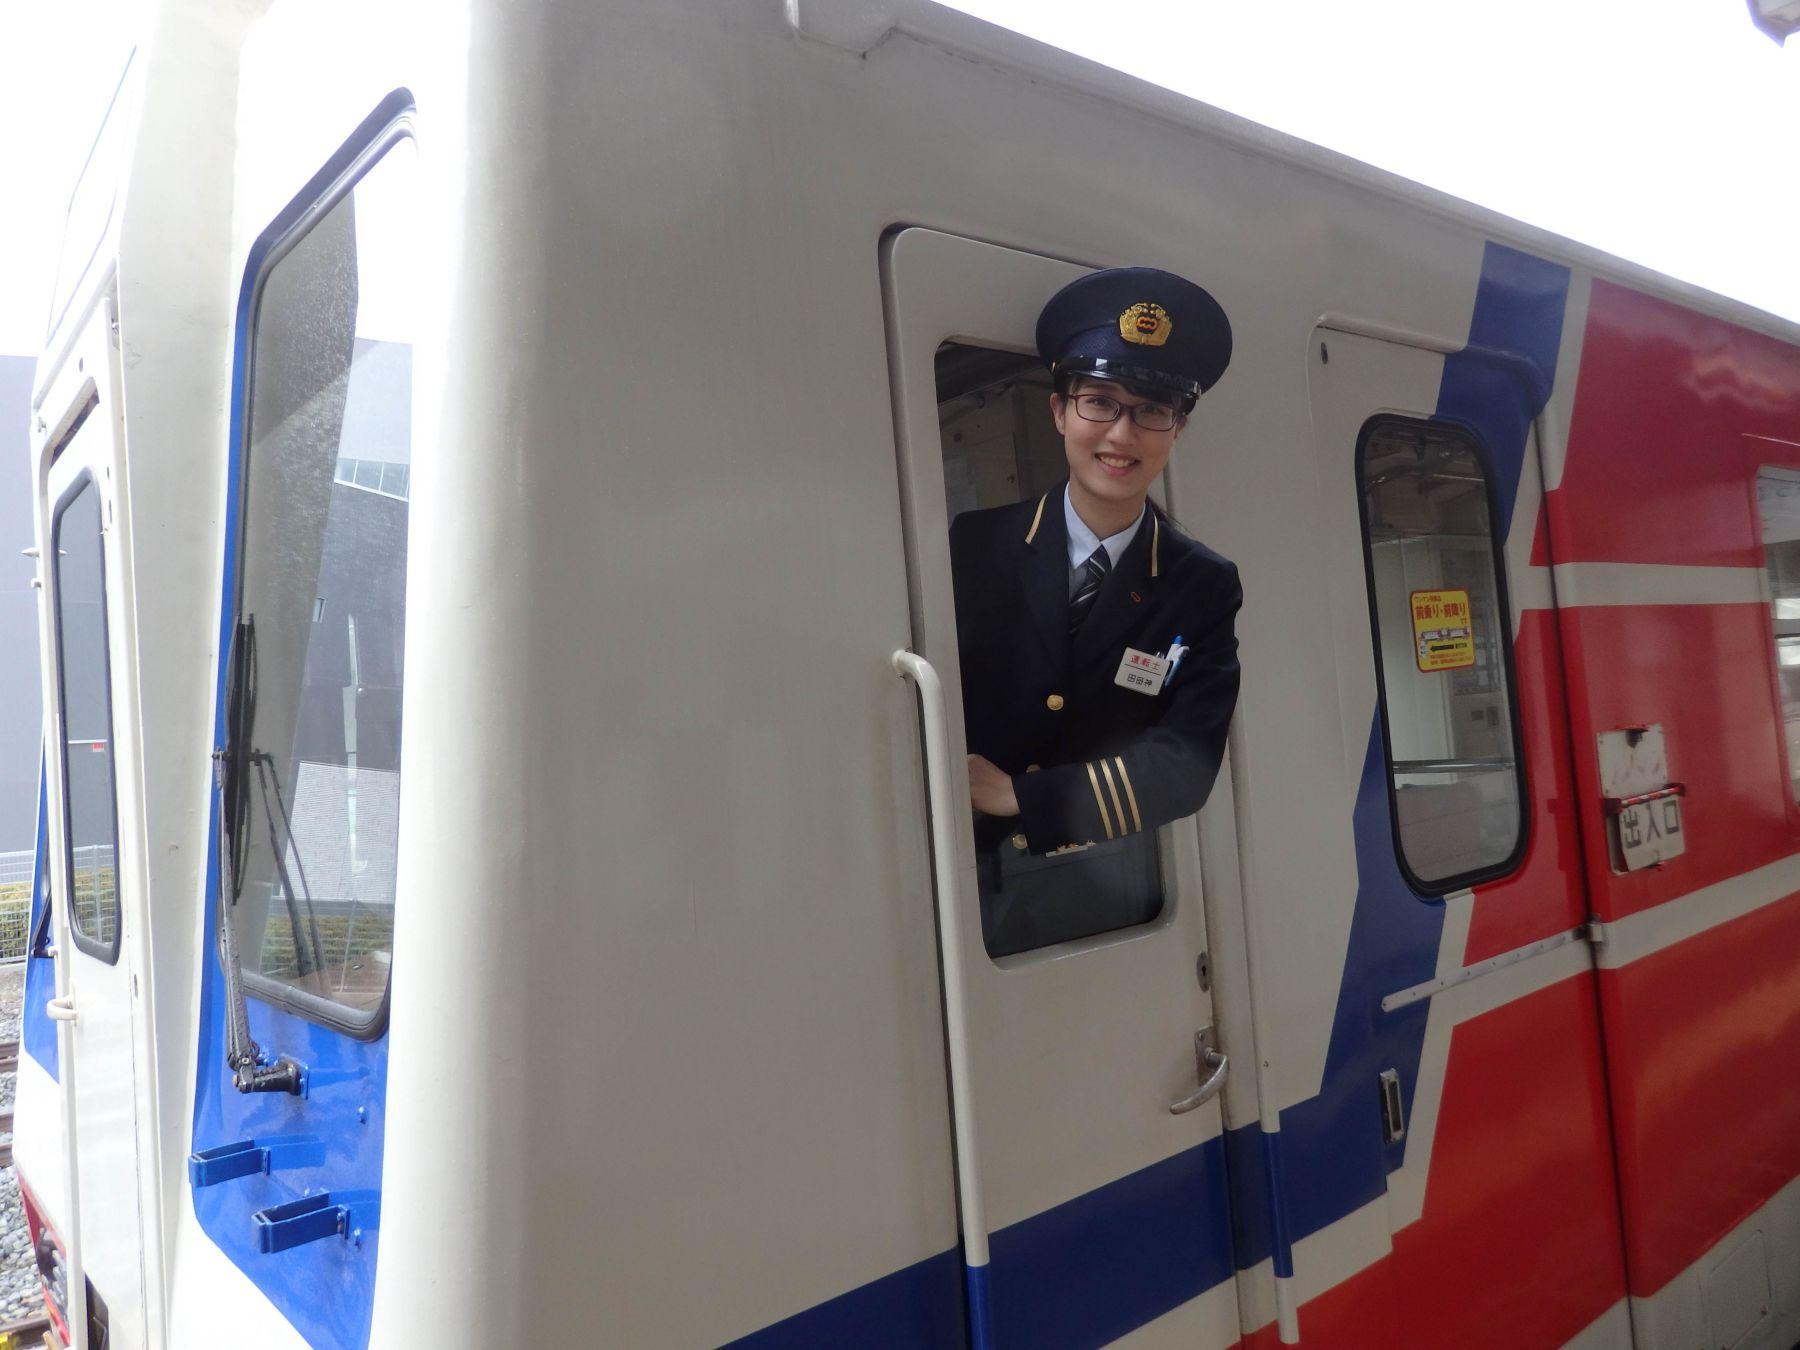 Japan Tsunami-Hit Sanriku Railway In Tohoku Resumes Full Operations After 8 Years 027